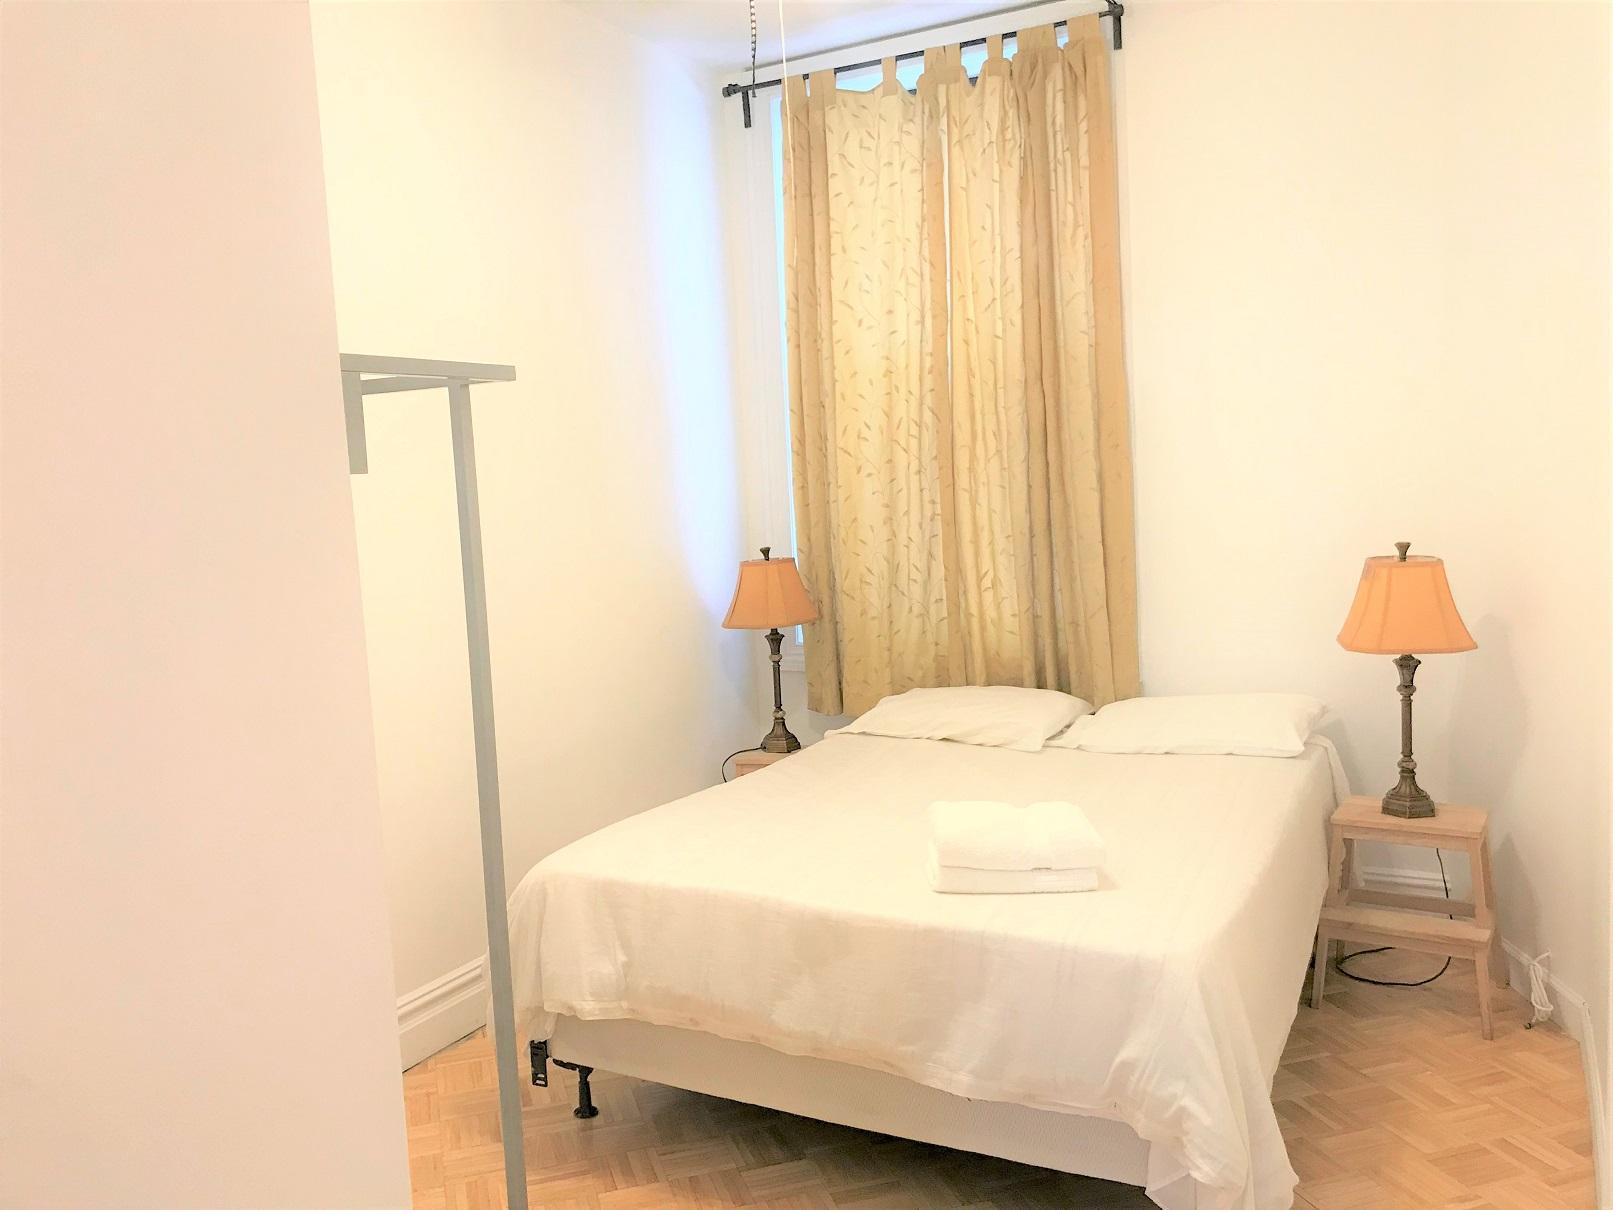 Park Avenue 3 Bedroom 1 Bath photo 8522847